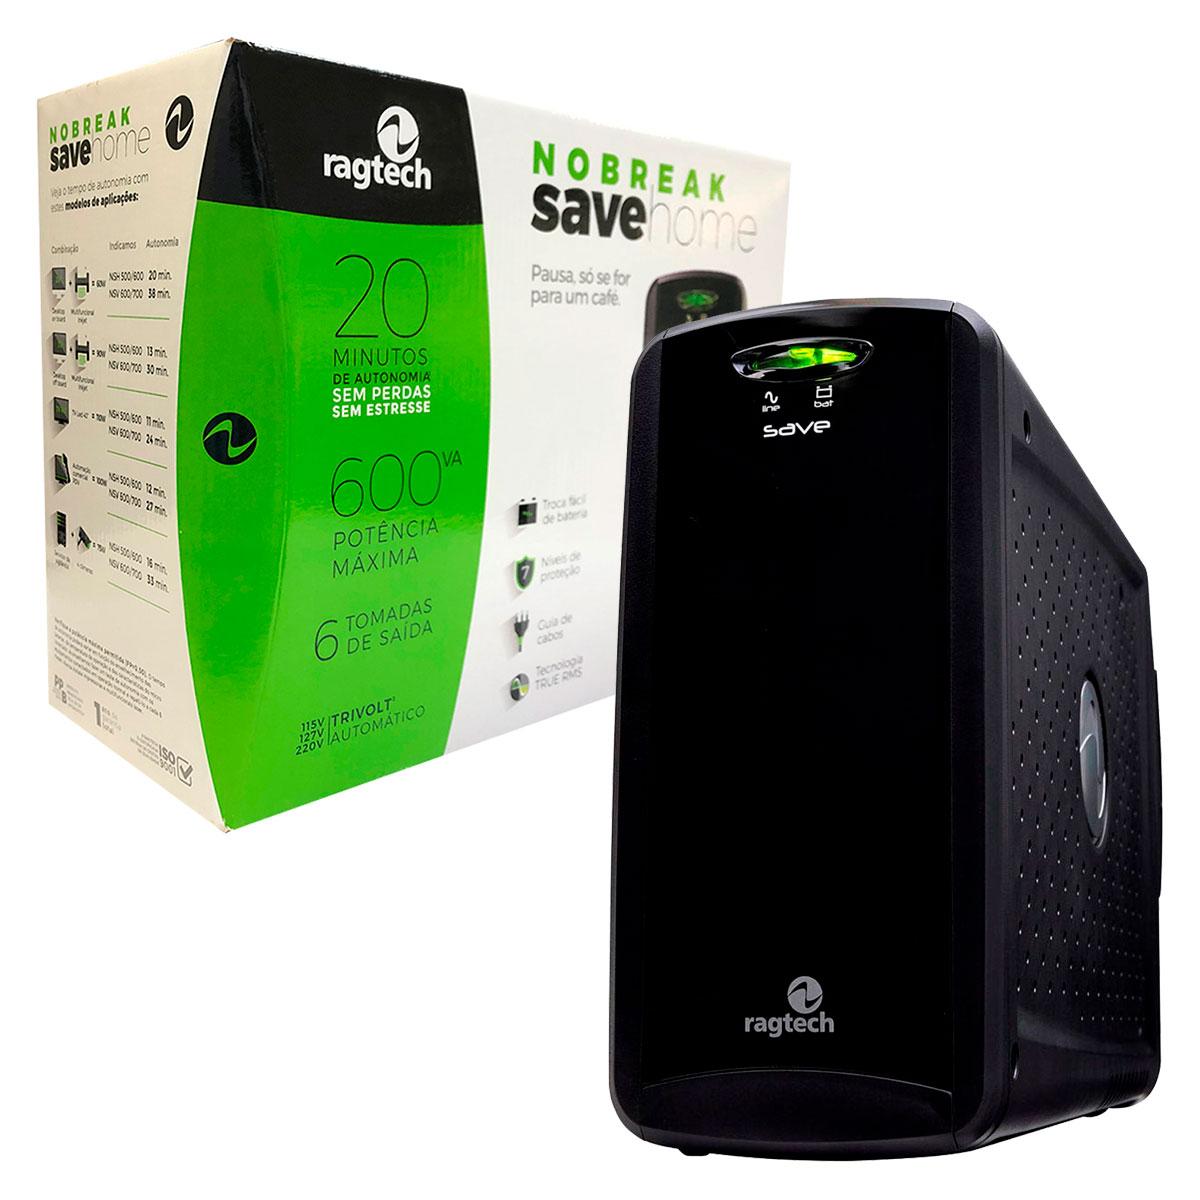 Nobreak 600VA Ragtech Save Home STD-TI, Entrada Trivolt, Saída 115V, 6 Tomadas, Preto - 20NSH4125